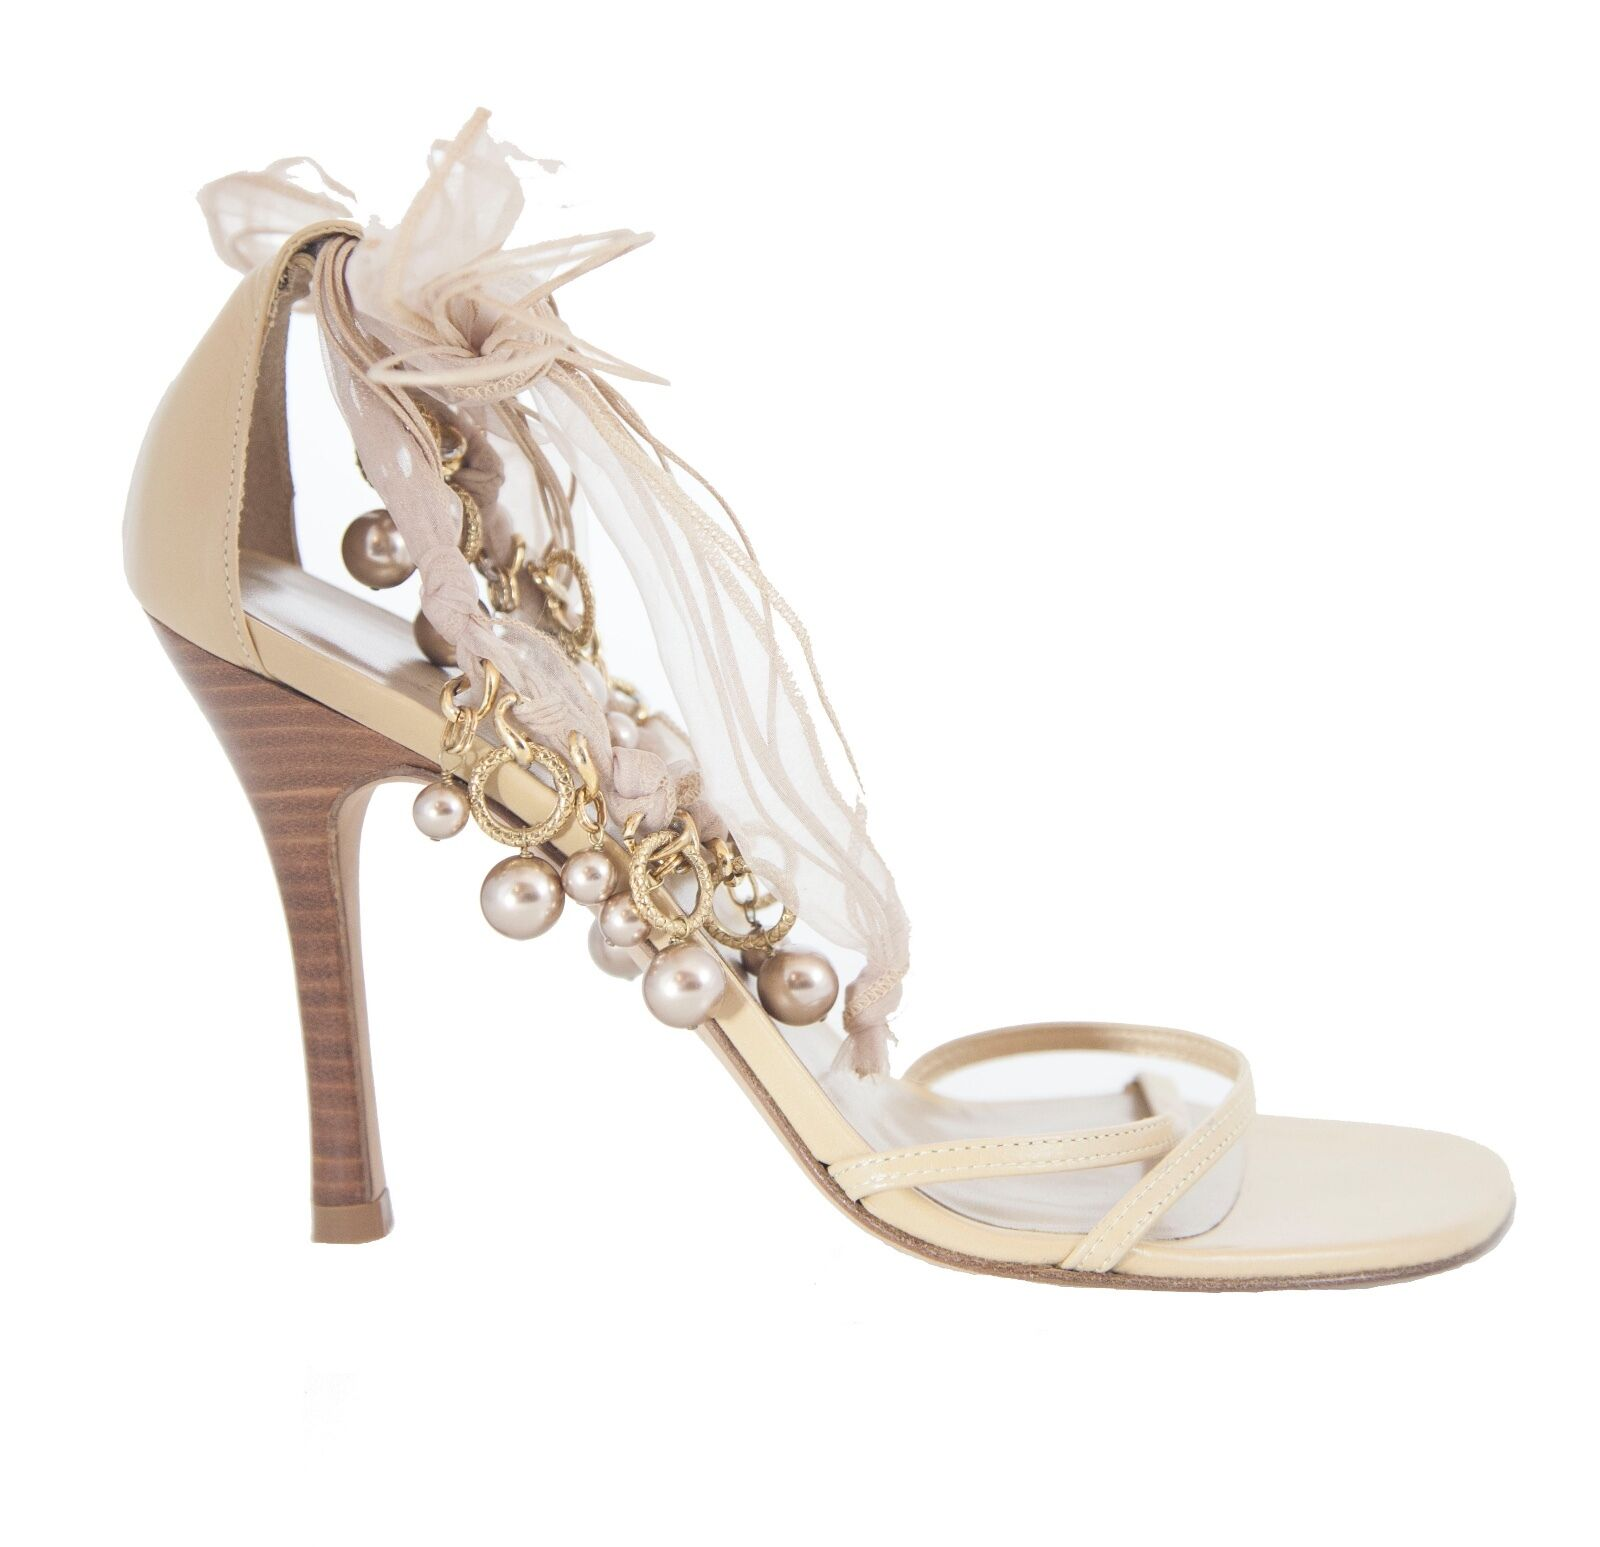 Stuart Weitzman sandals tan leather open-toe tie detail strappy sandals Weitzman size 6.5 NEW 729285